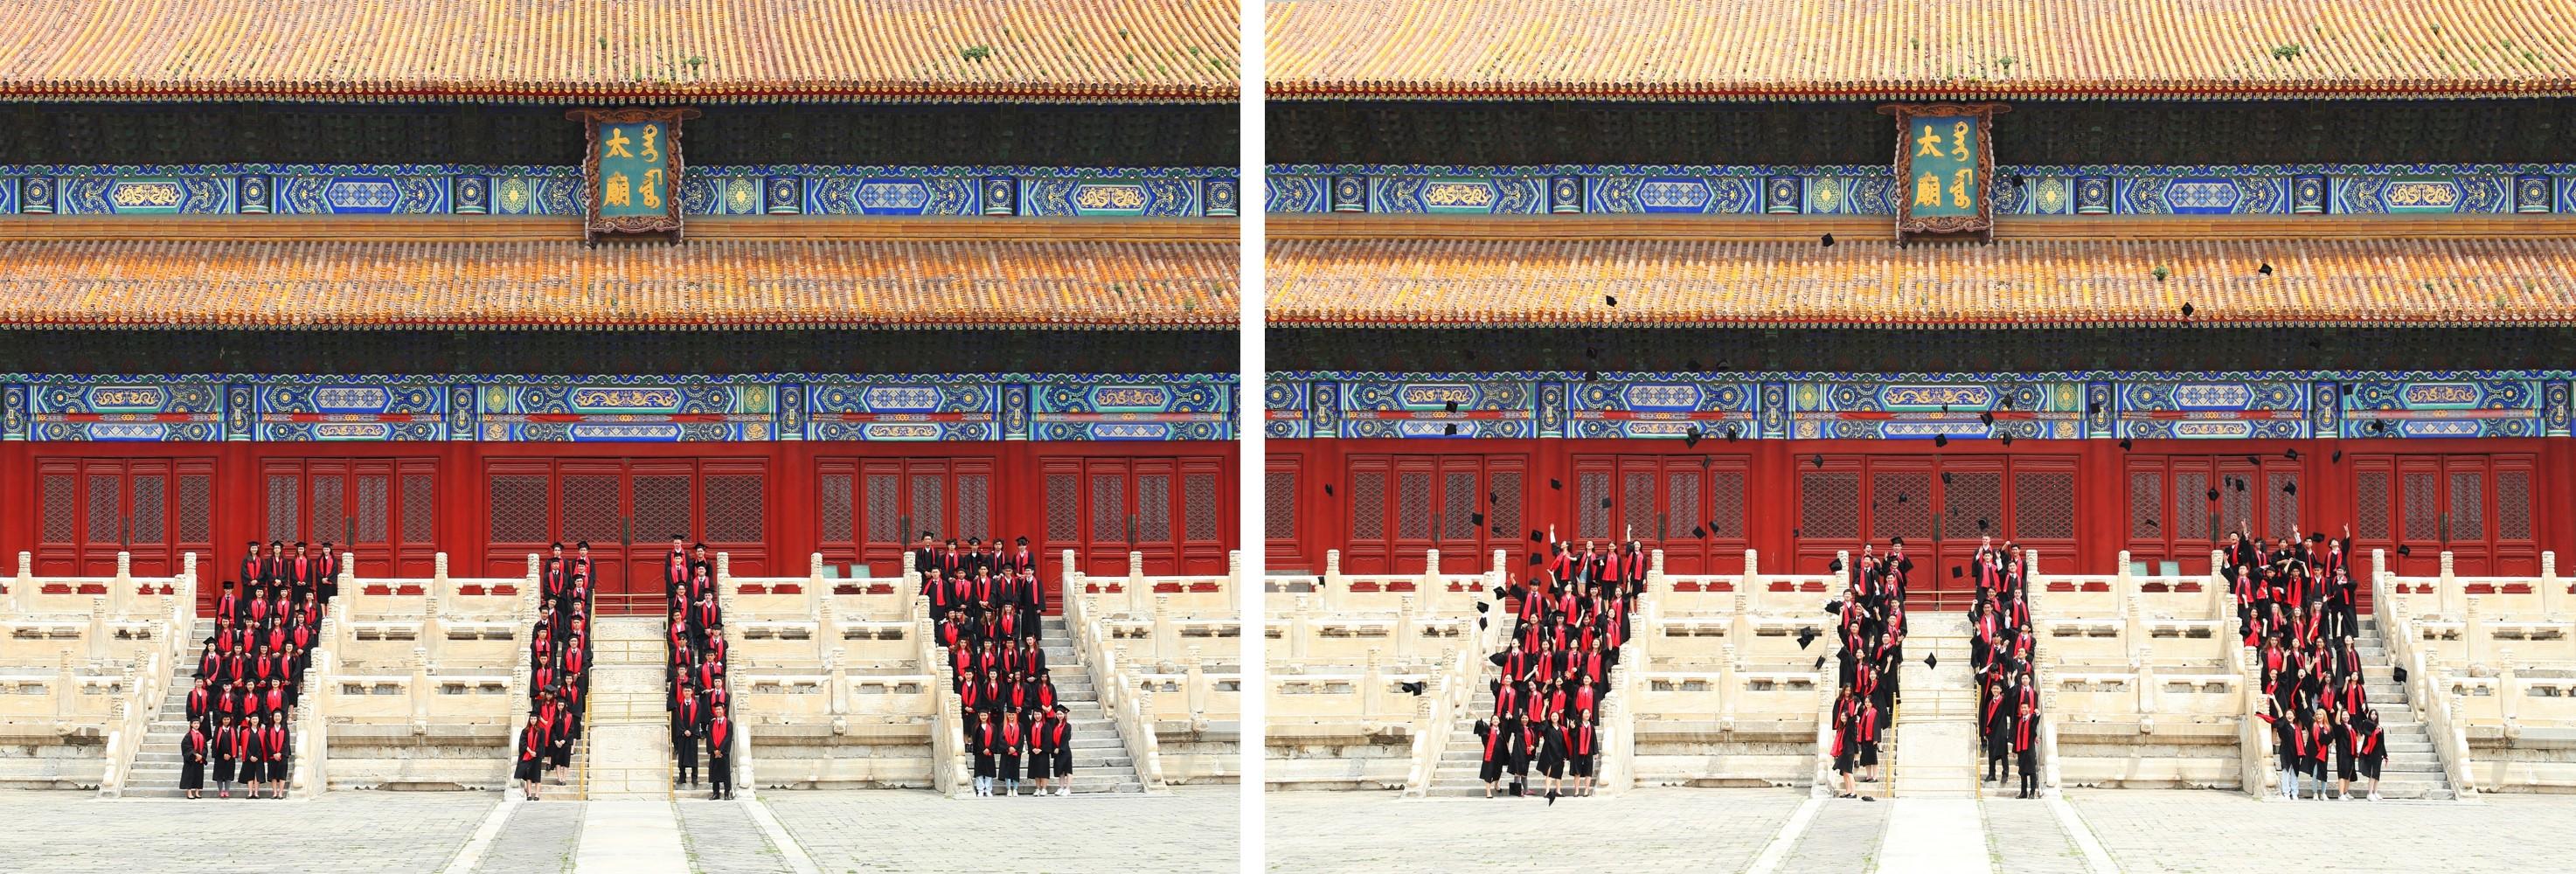 graduation-dulwich-college-beijing-20200630-152058-1-北京德威英国国际学校-20200731-172808-217